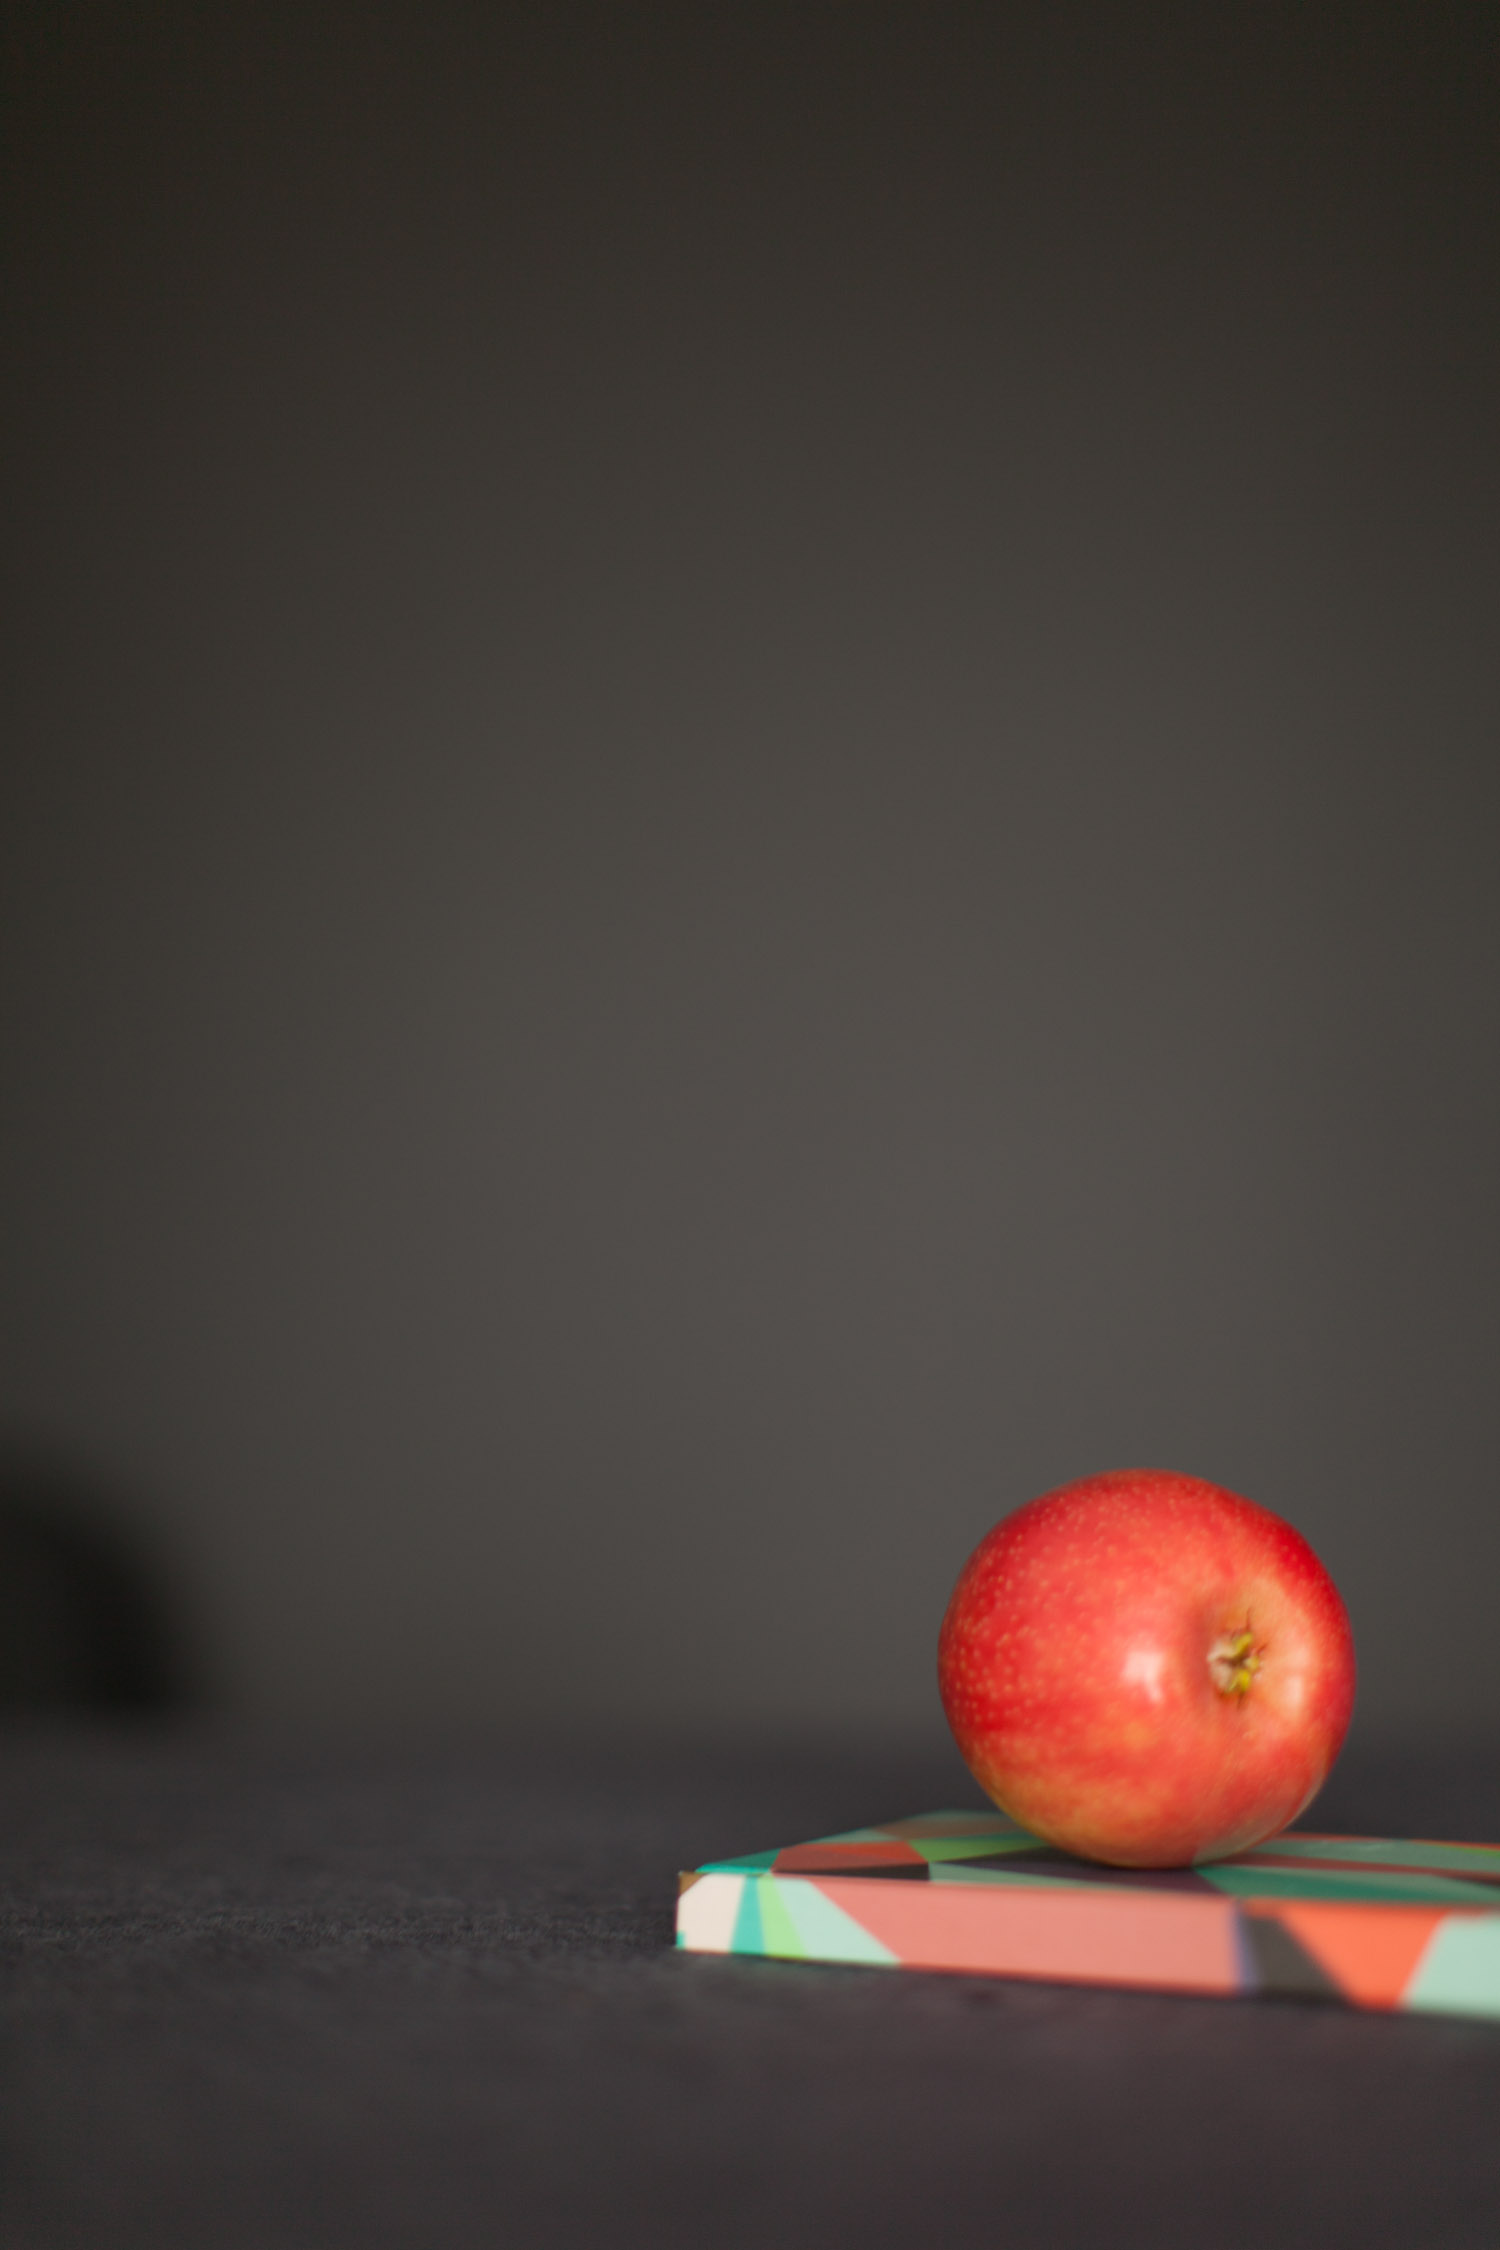 AppleNotebook-9138.jpg